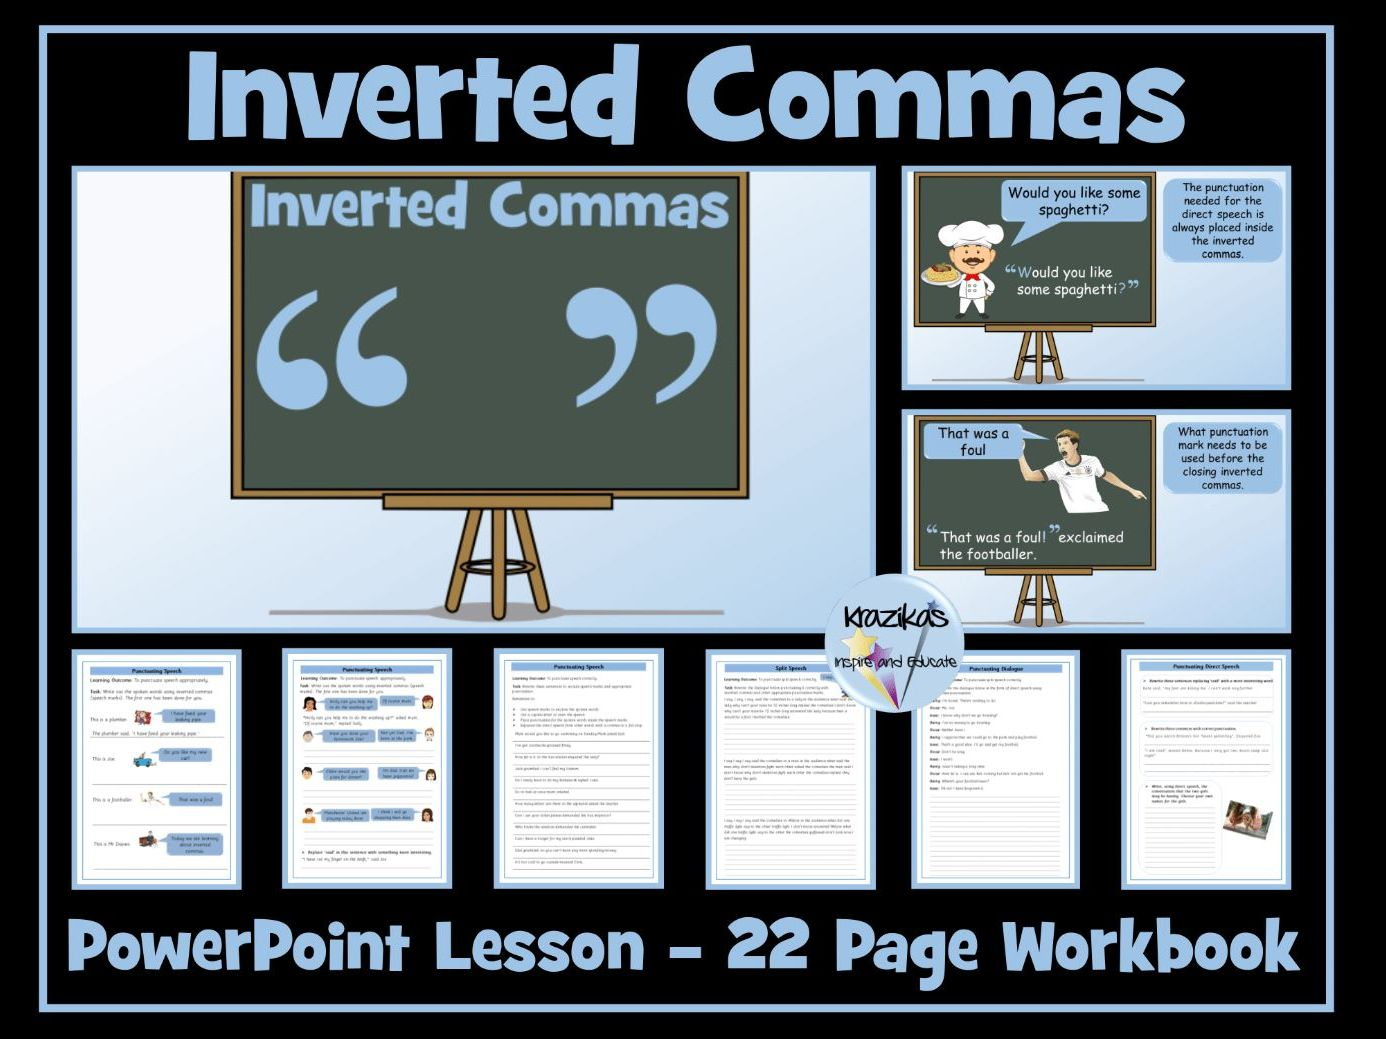 Inverted Commas / Speech Marks